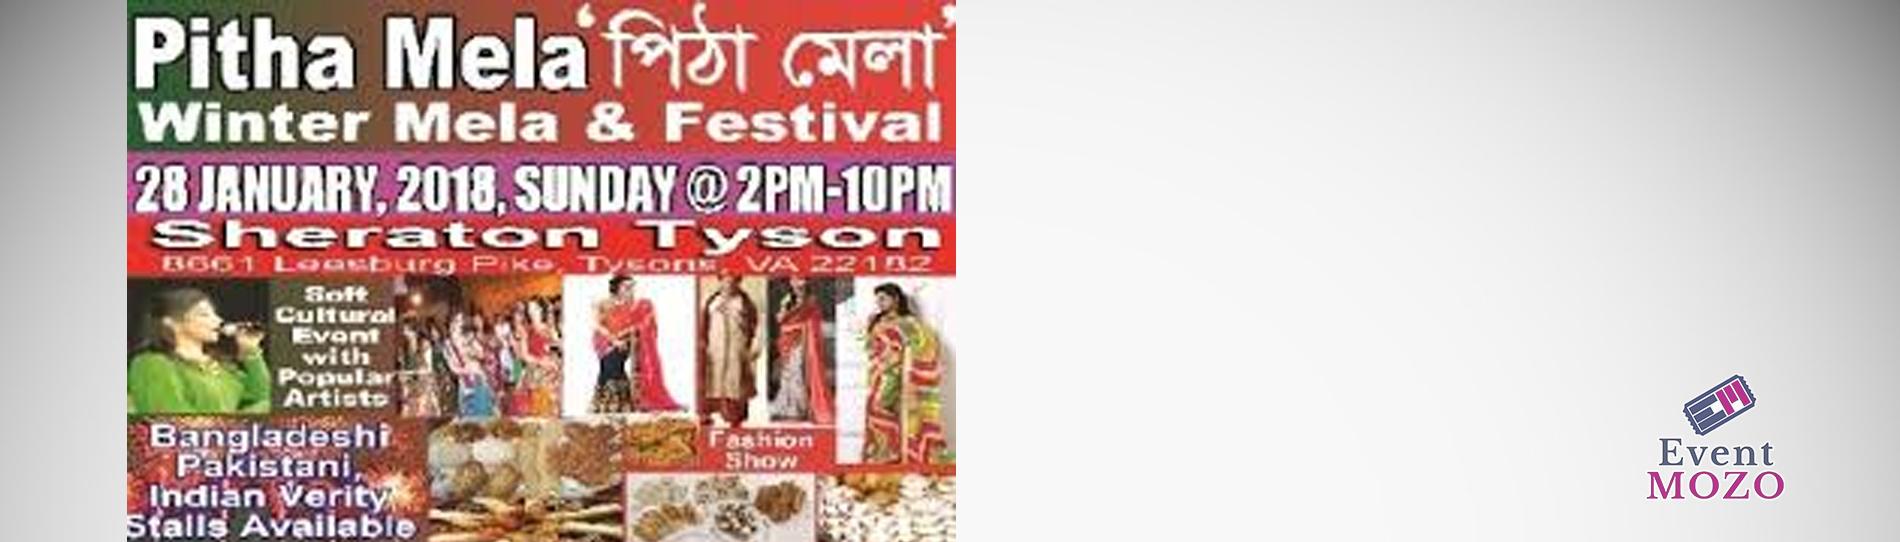 EventMozo Pak Bangla & Indo Winter Festival Pitha Mela on 28 January 2018